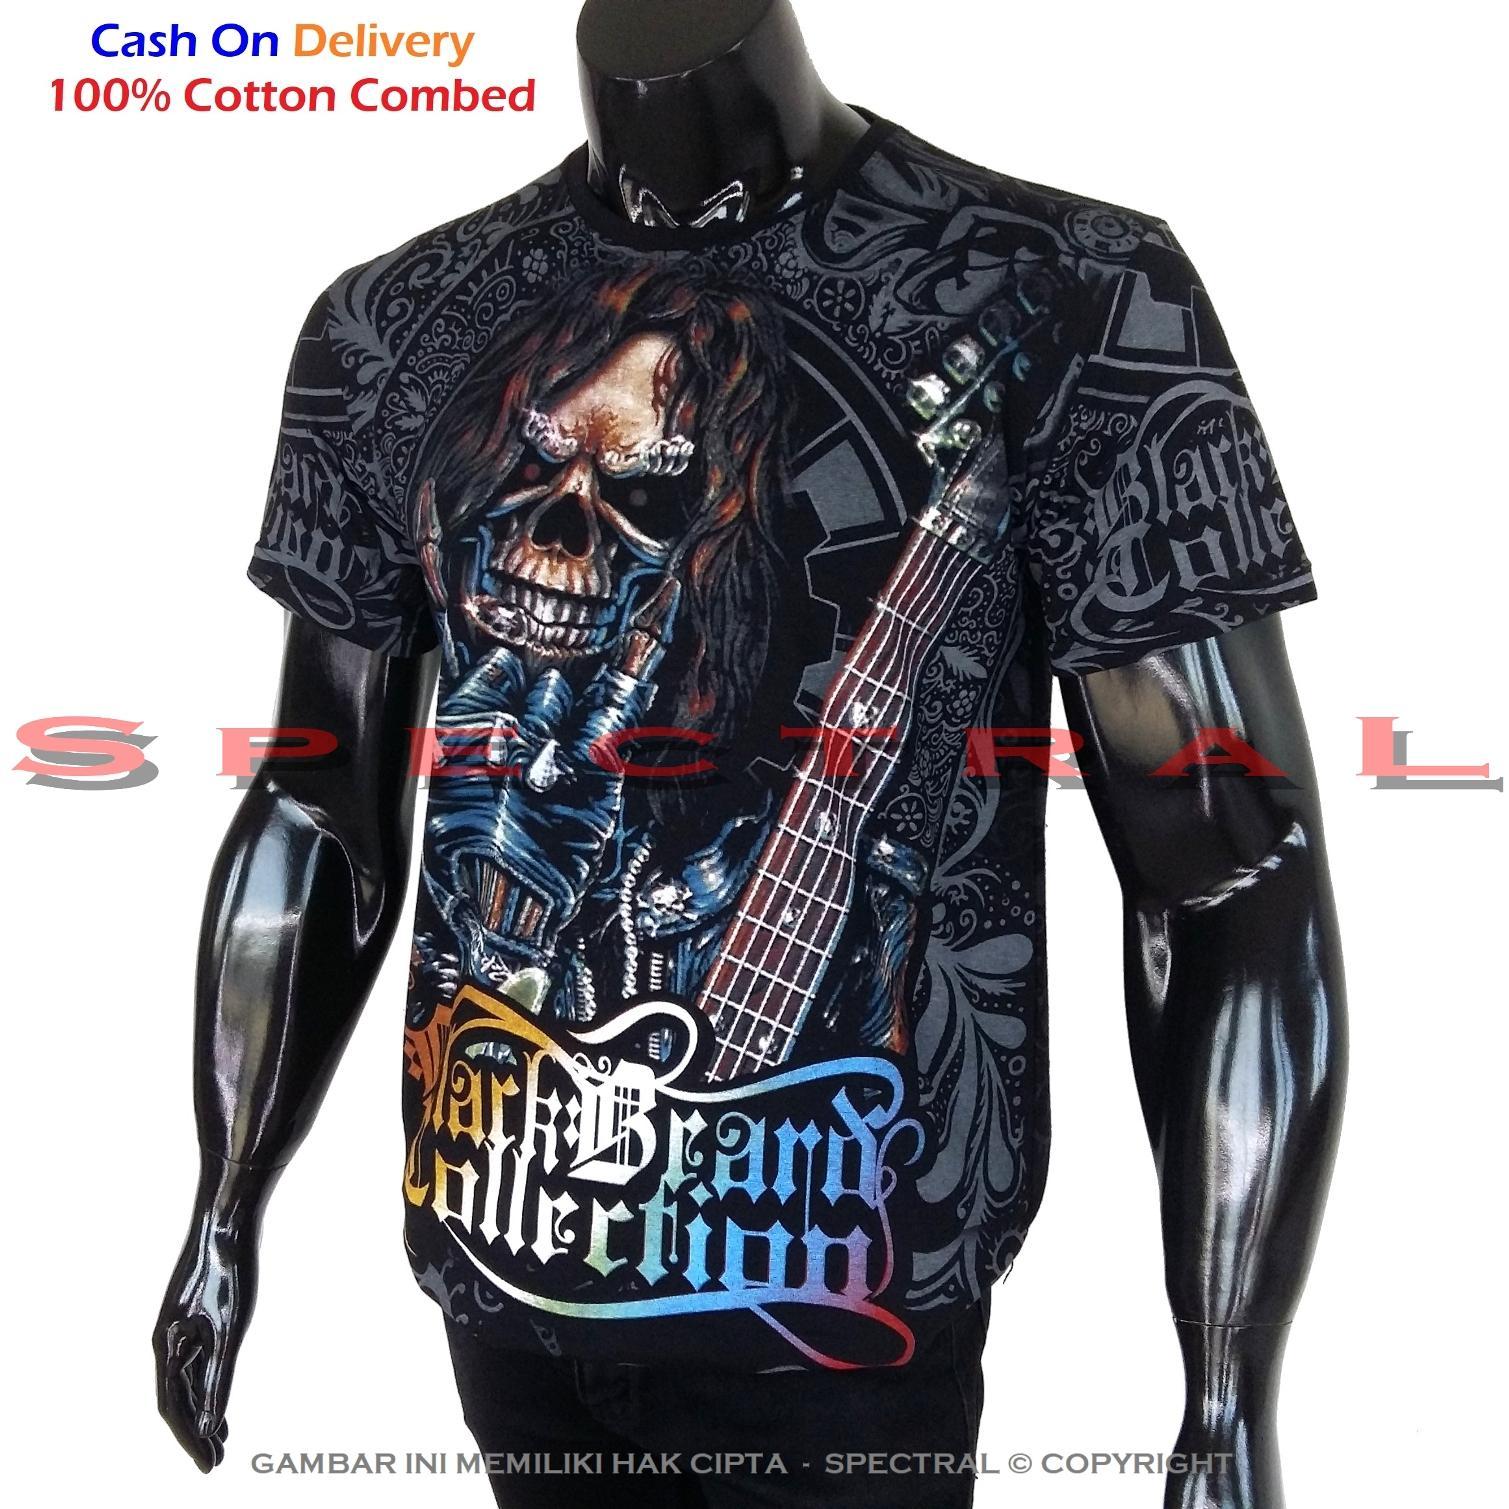 Spectral - Black Premium Cotton - Kaos Tengkorak - Pure Cotton Combed 30s - Zombie Gitar Metal Horo